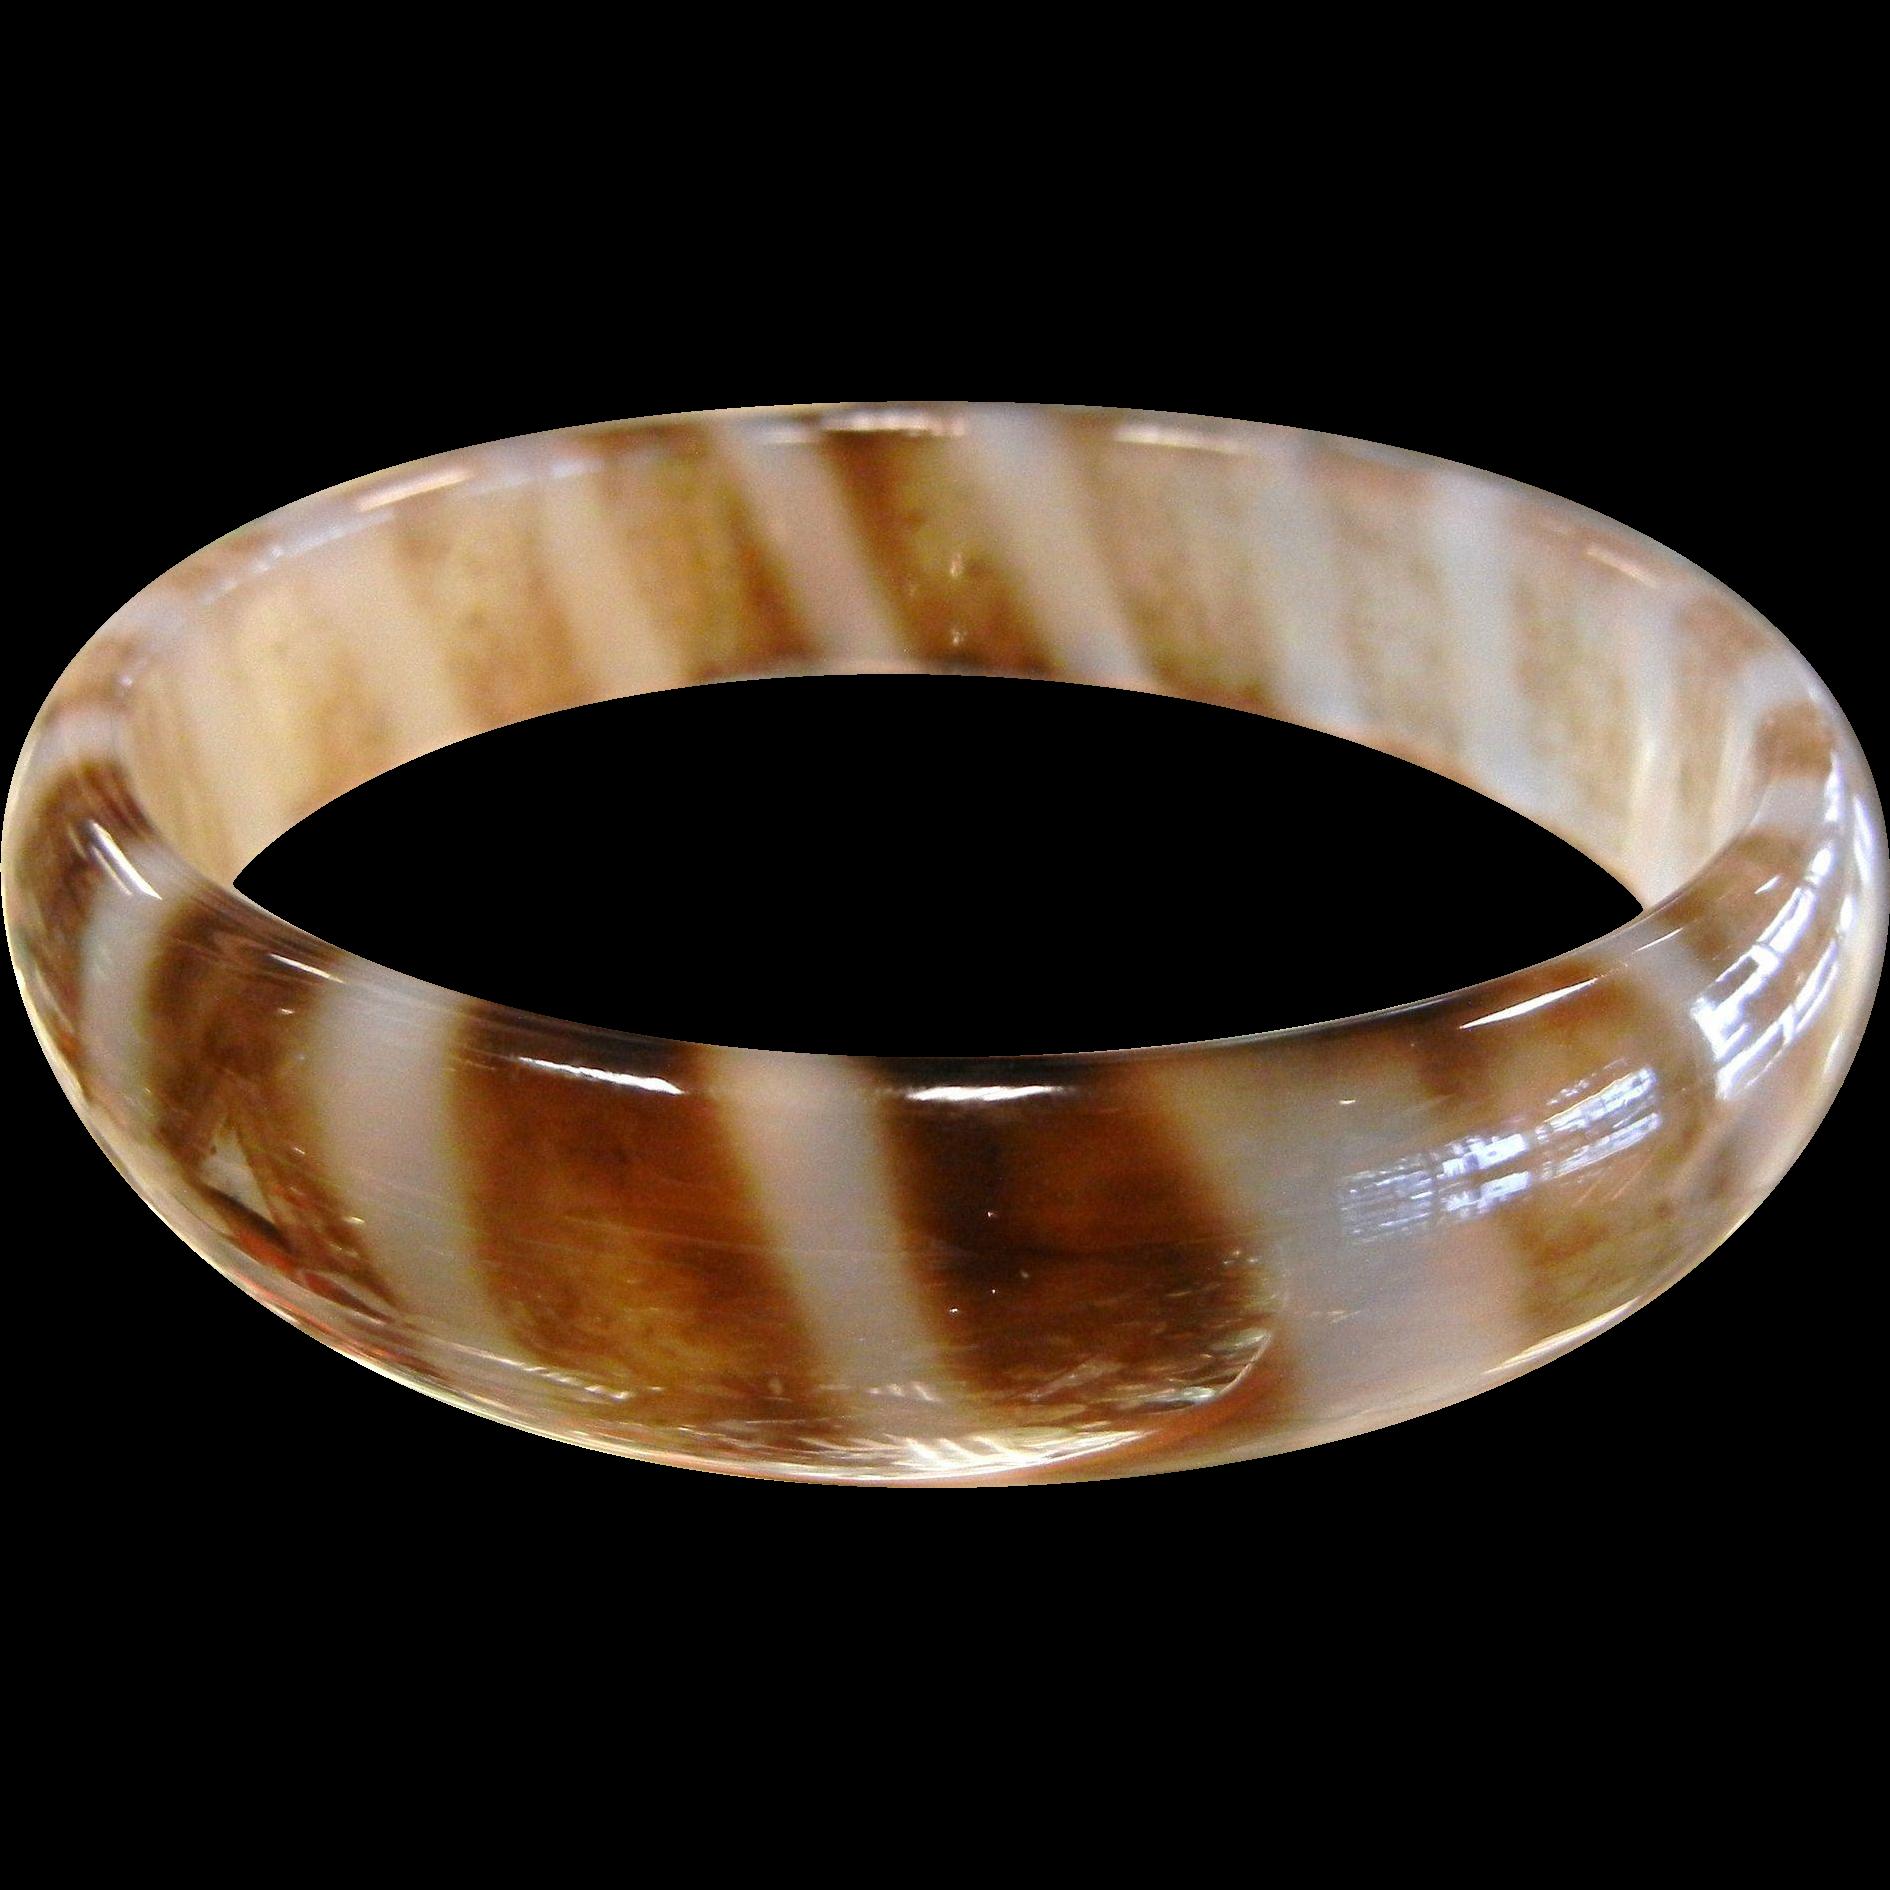 Fabulous Polished Natural Banded Agate Bangle Bracelet